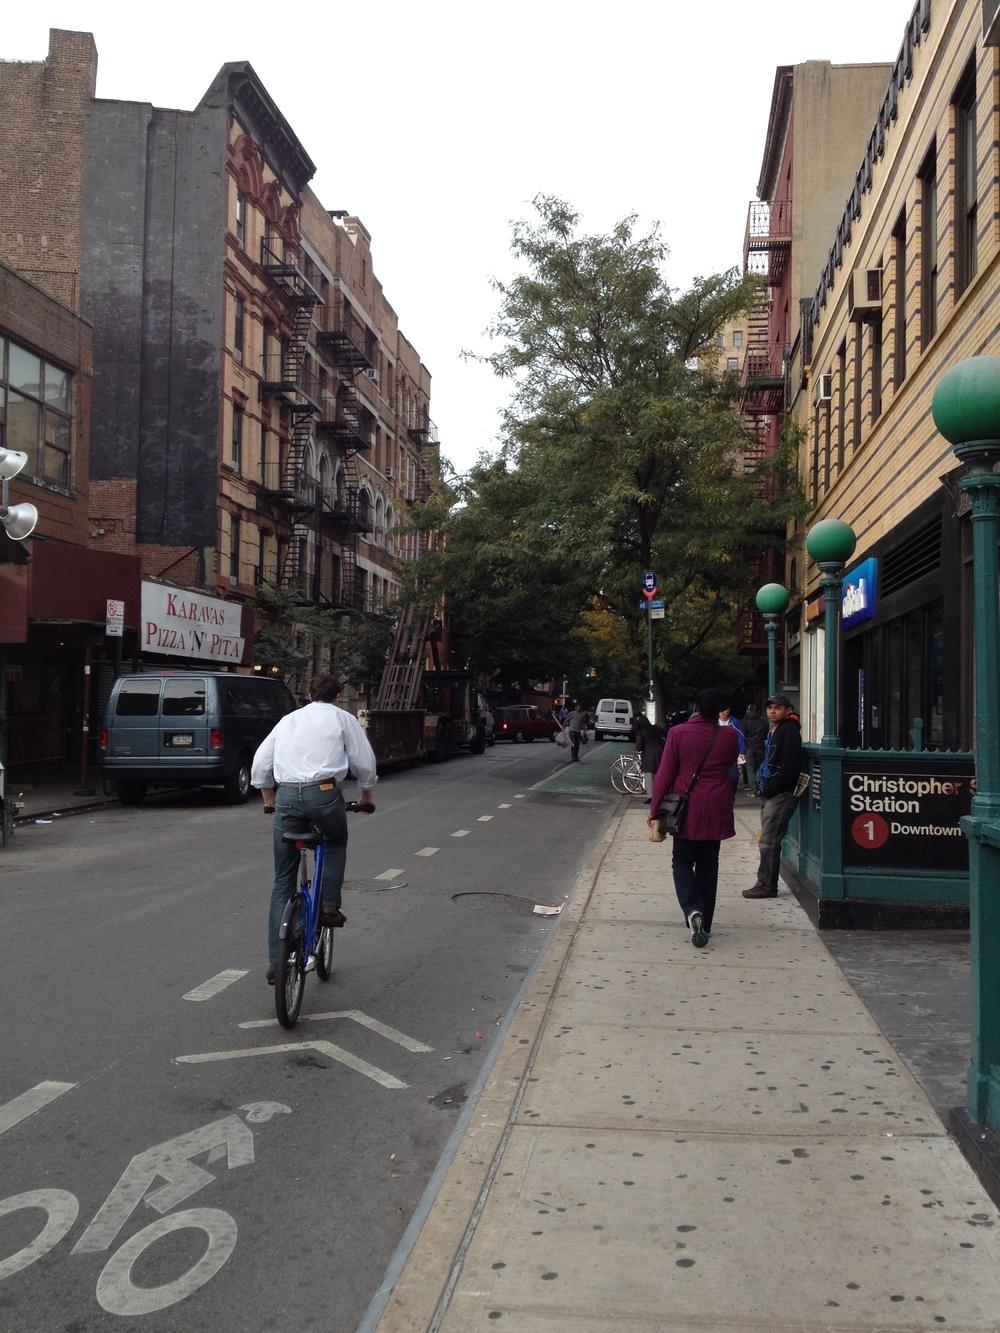 Heather's neighbourhood in Greenwich Village, New York City.